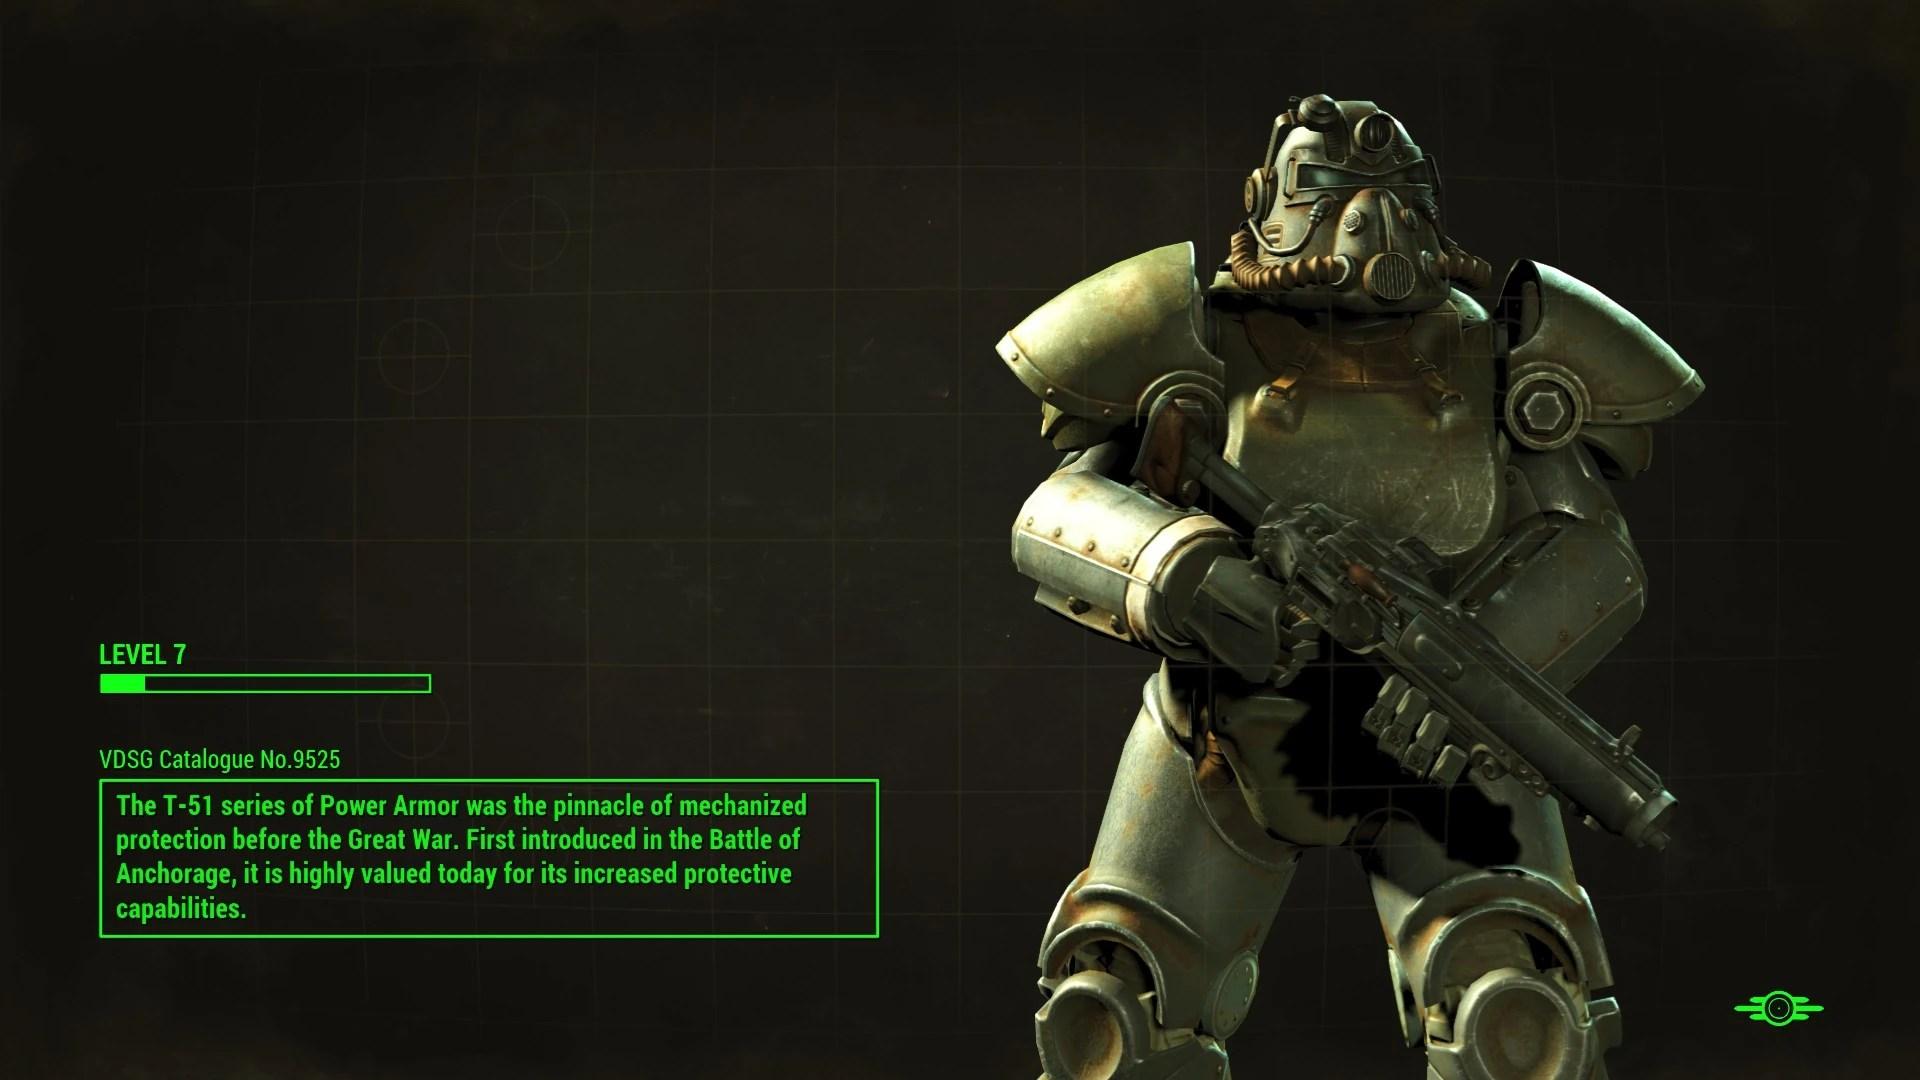 Image FO4 T 51 Loading Screenjpg Fallout Wiki